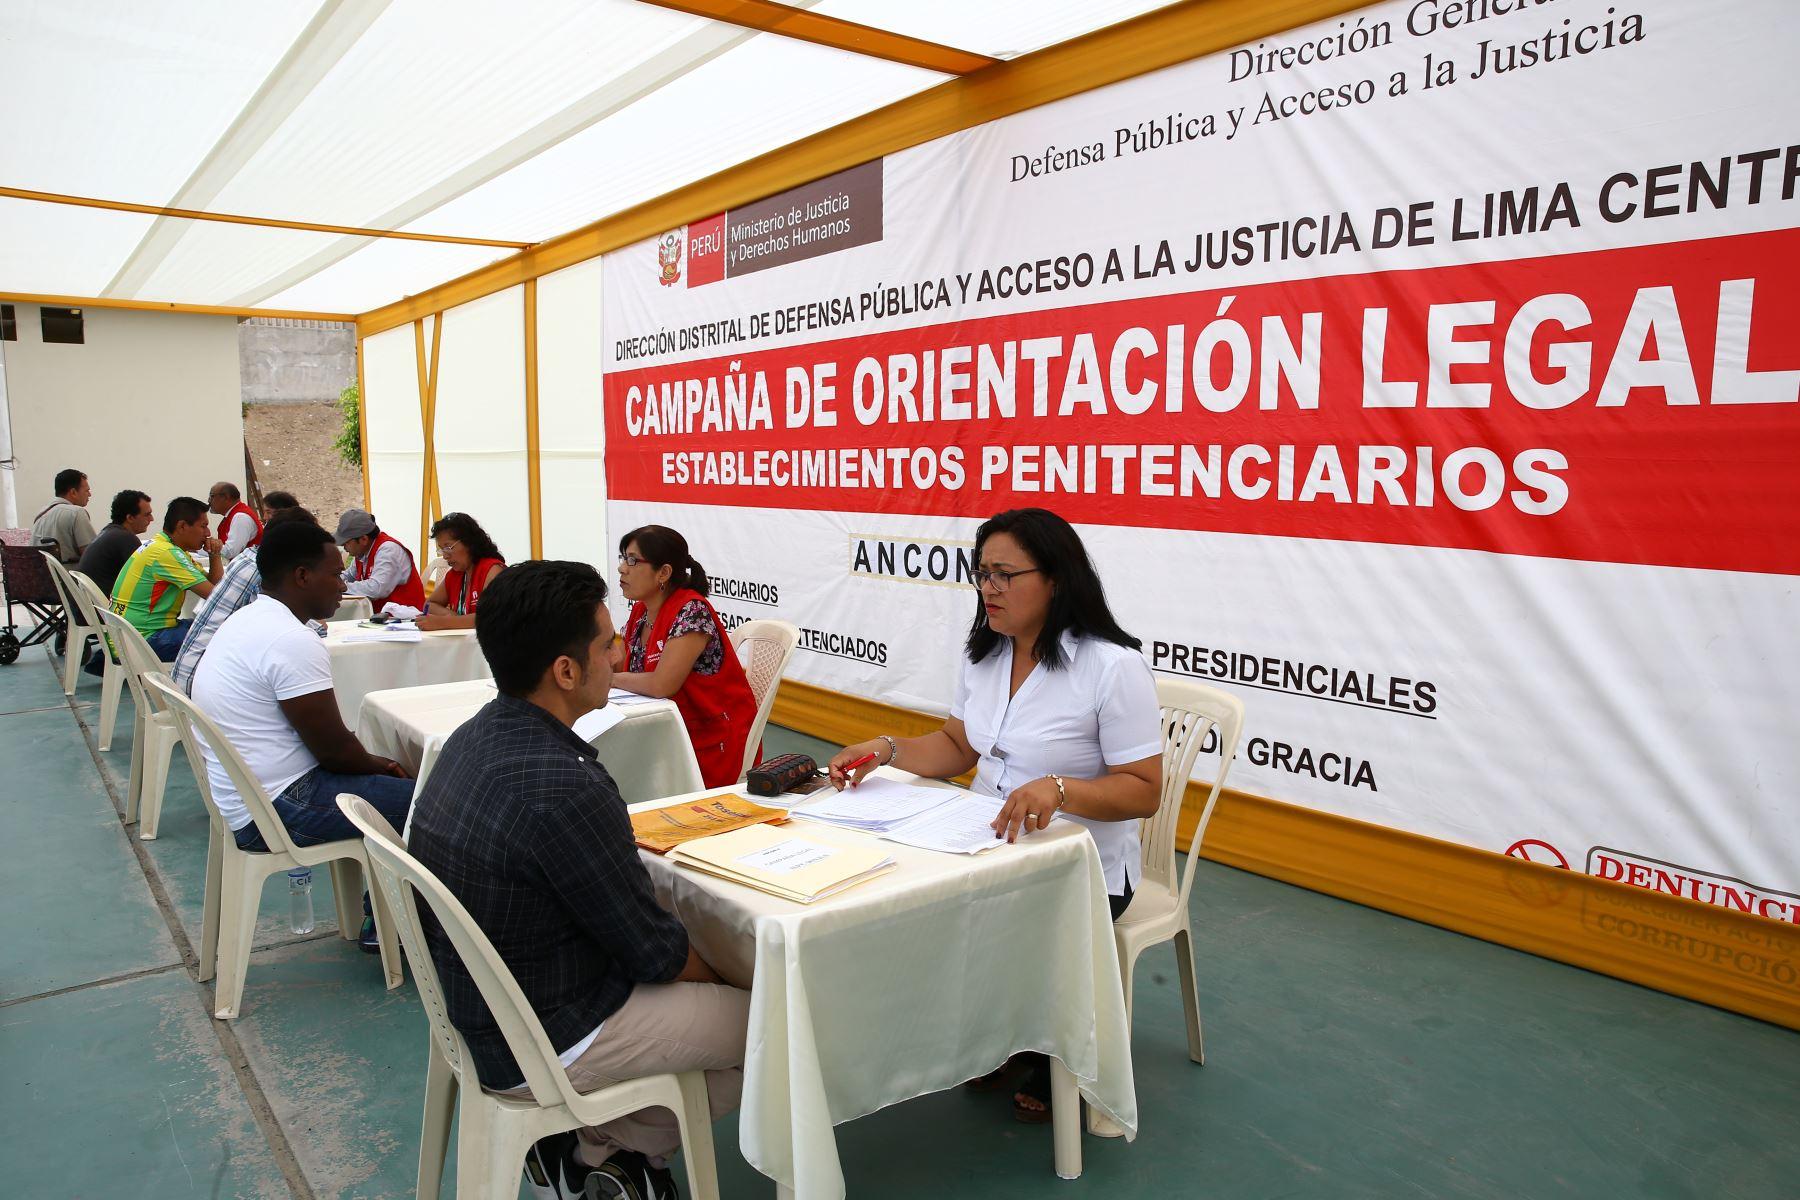 LIMA PERÚ - FEBRERO 22. INPE realiza campaña de asistencia legal para internos extranjeros a nivel nacional.  Foto: ANDINA/Melina Mejía